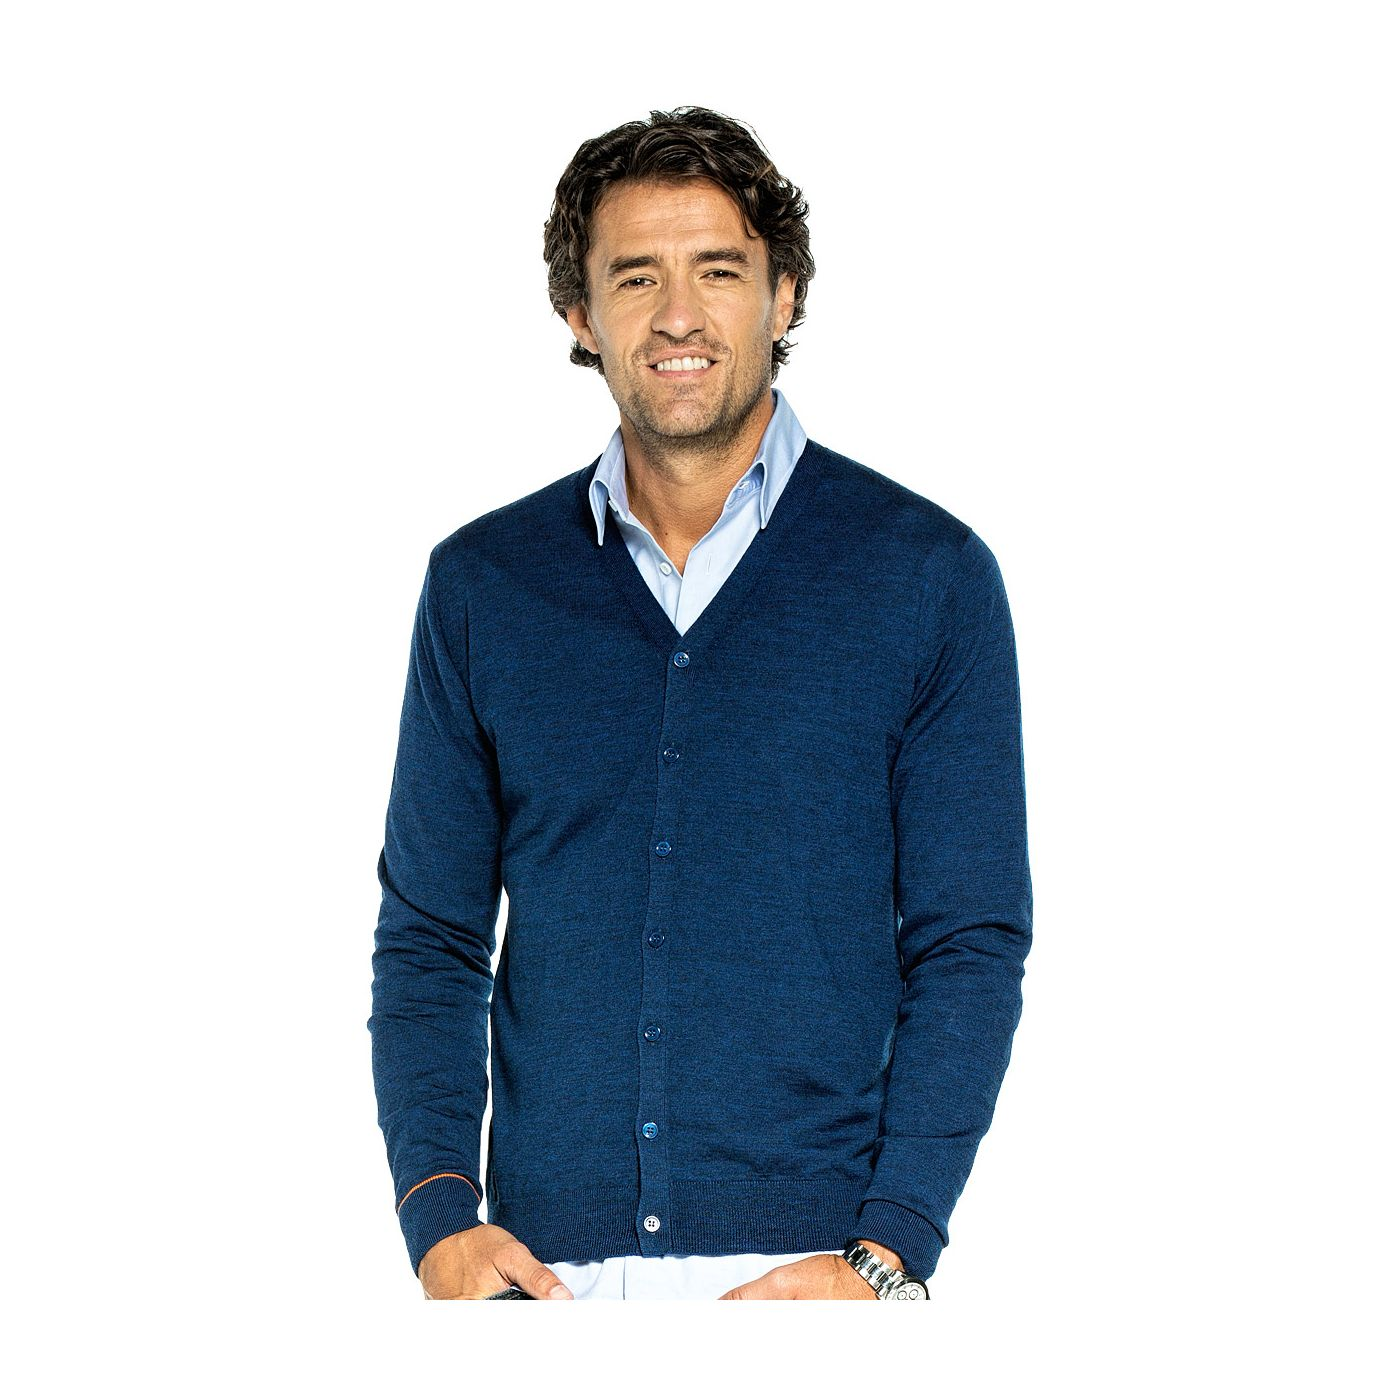 Cardigan for men made of Merino wool in Blue